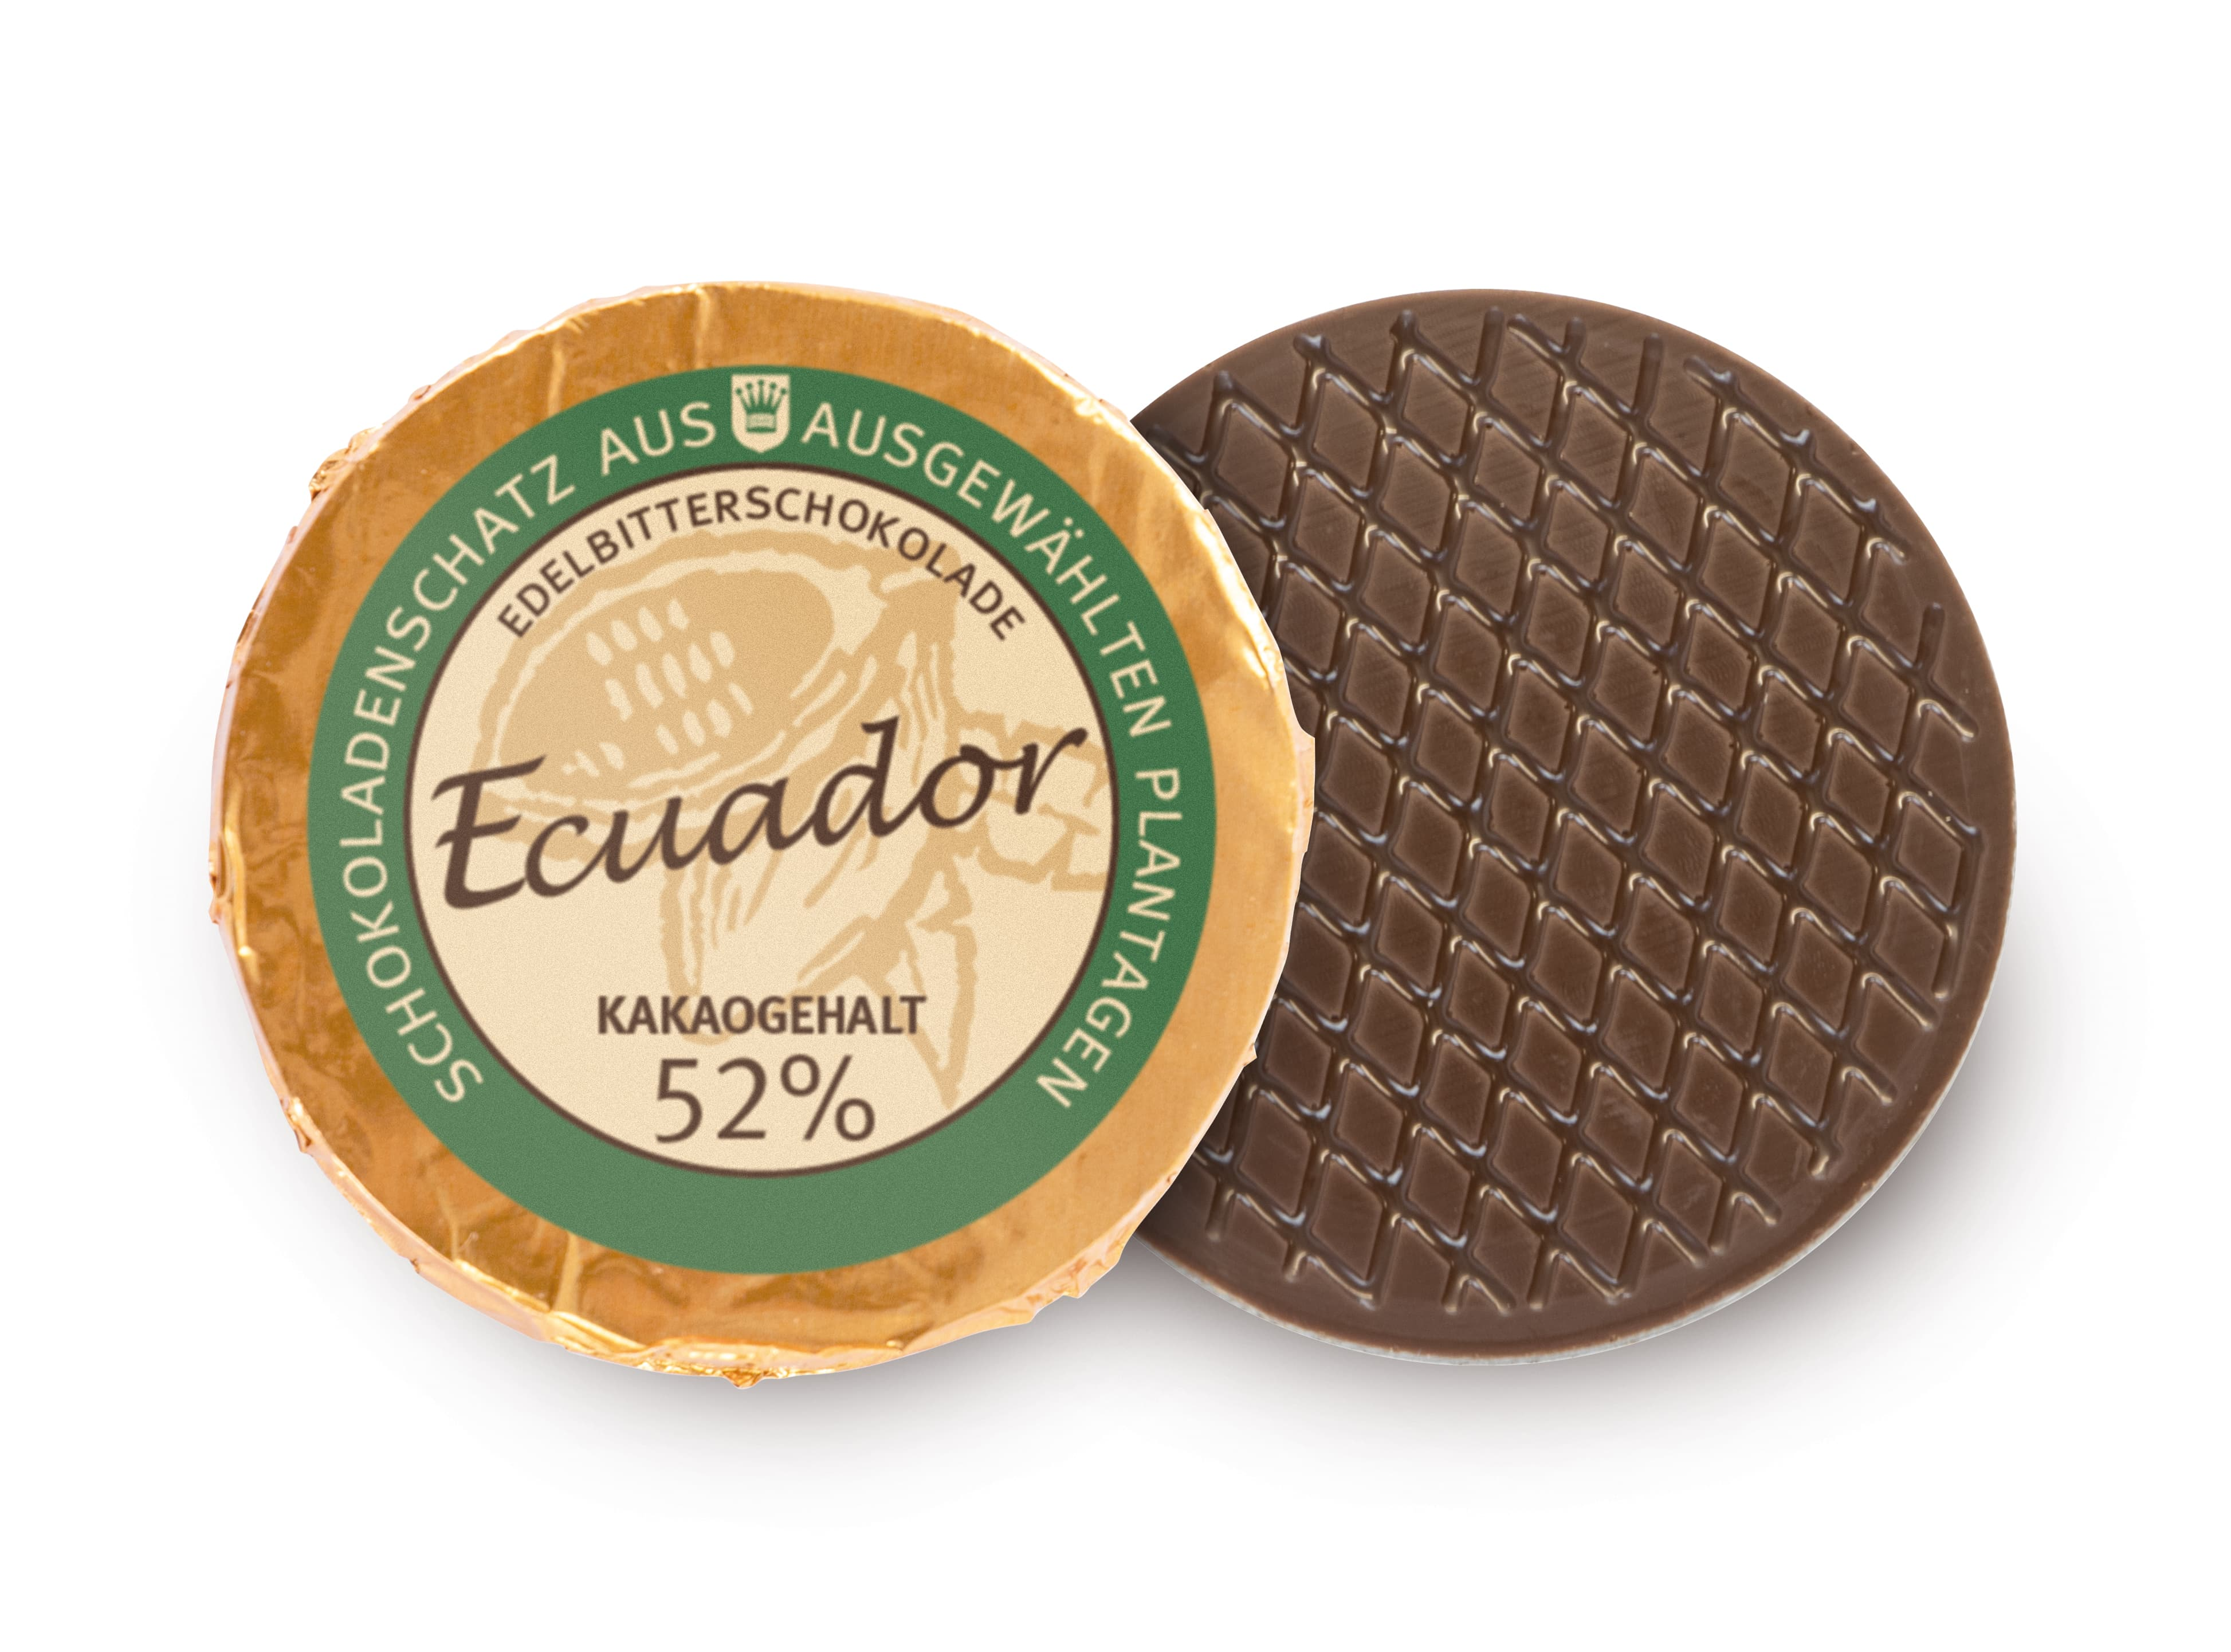 Golddublone aus Ecuador-Schokolade mit 52 % Kakaogehalt